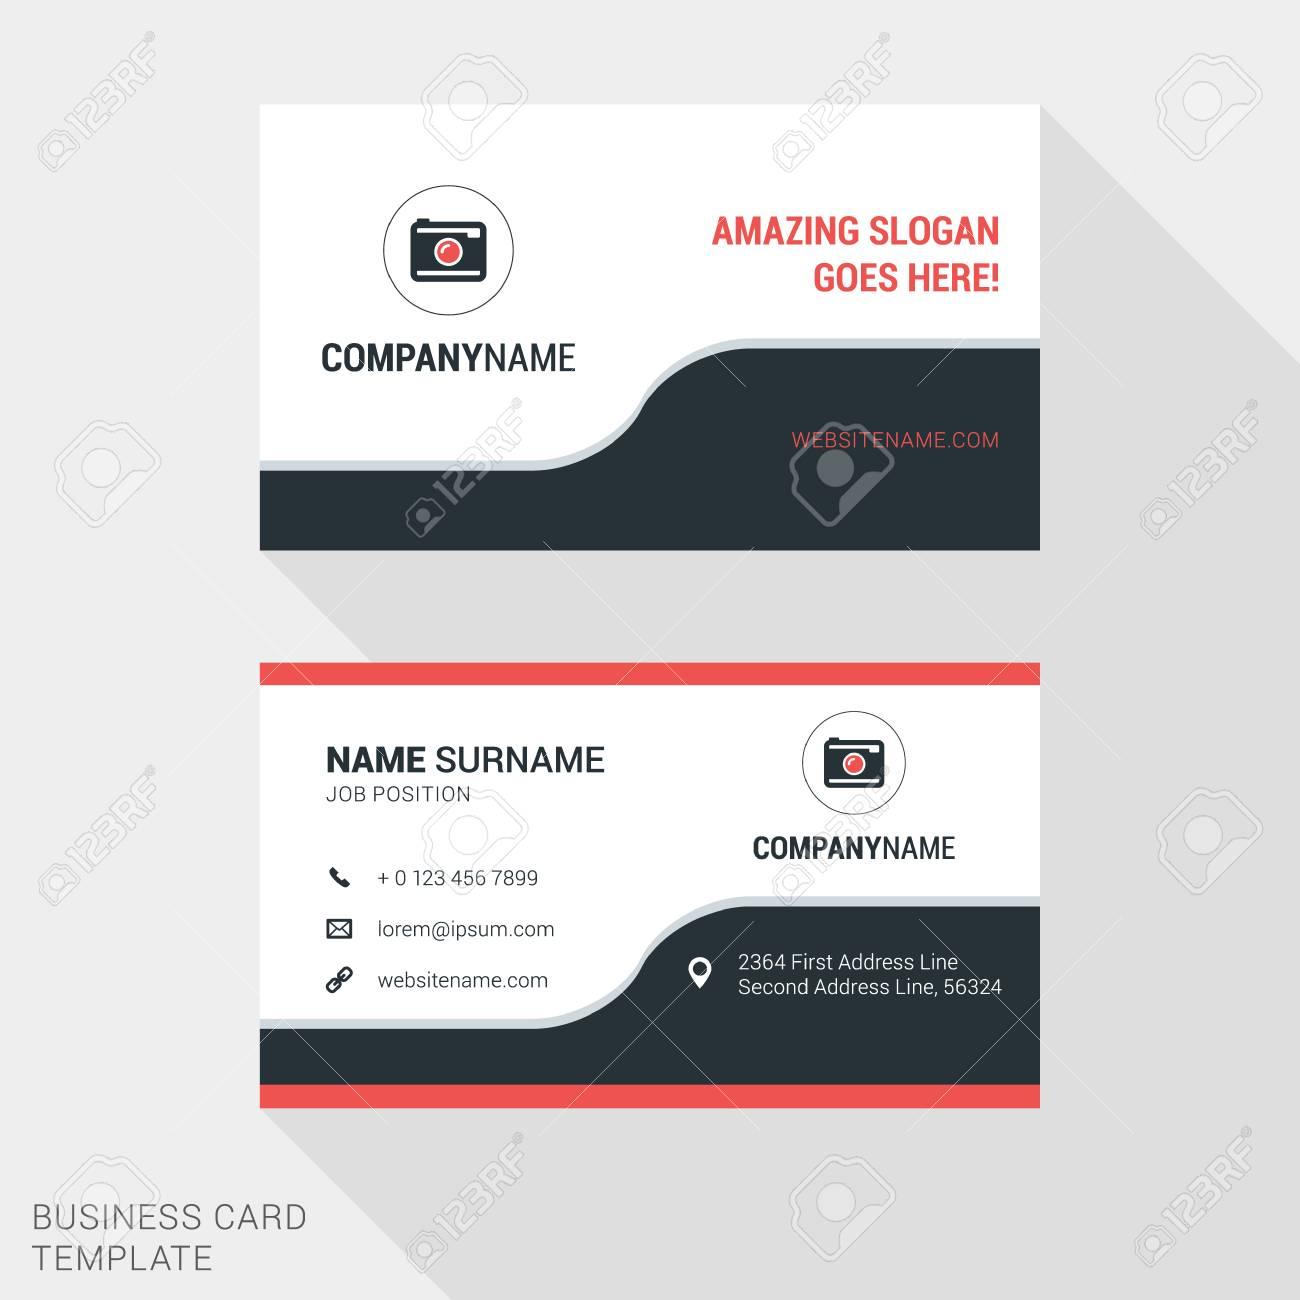 Creative business card print template flat design vector creative business card print template flat design vector illustration stationery design stock vector colourmoves